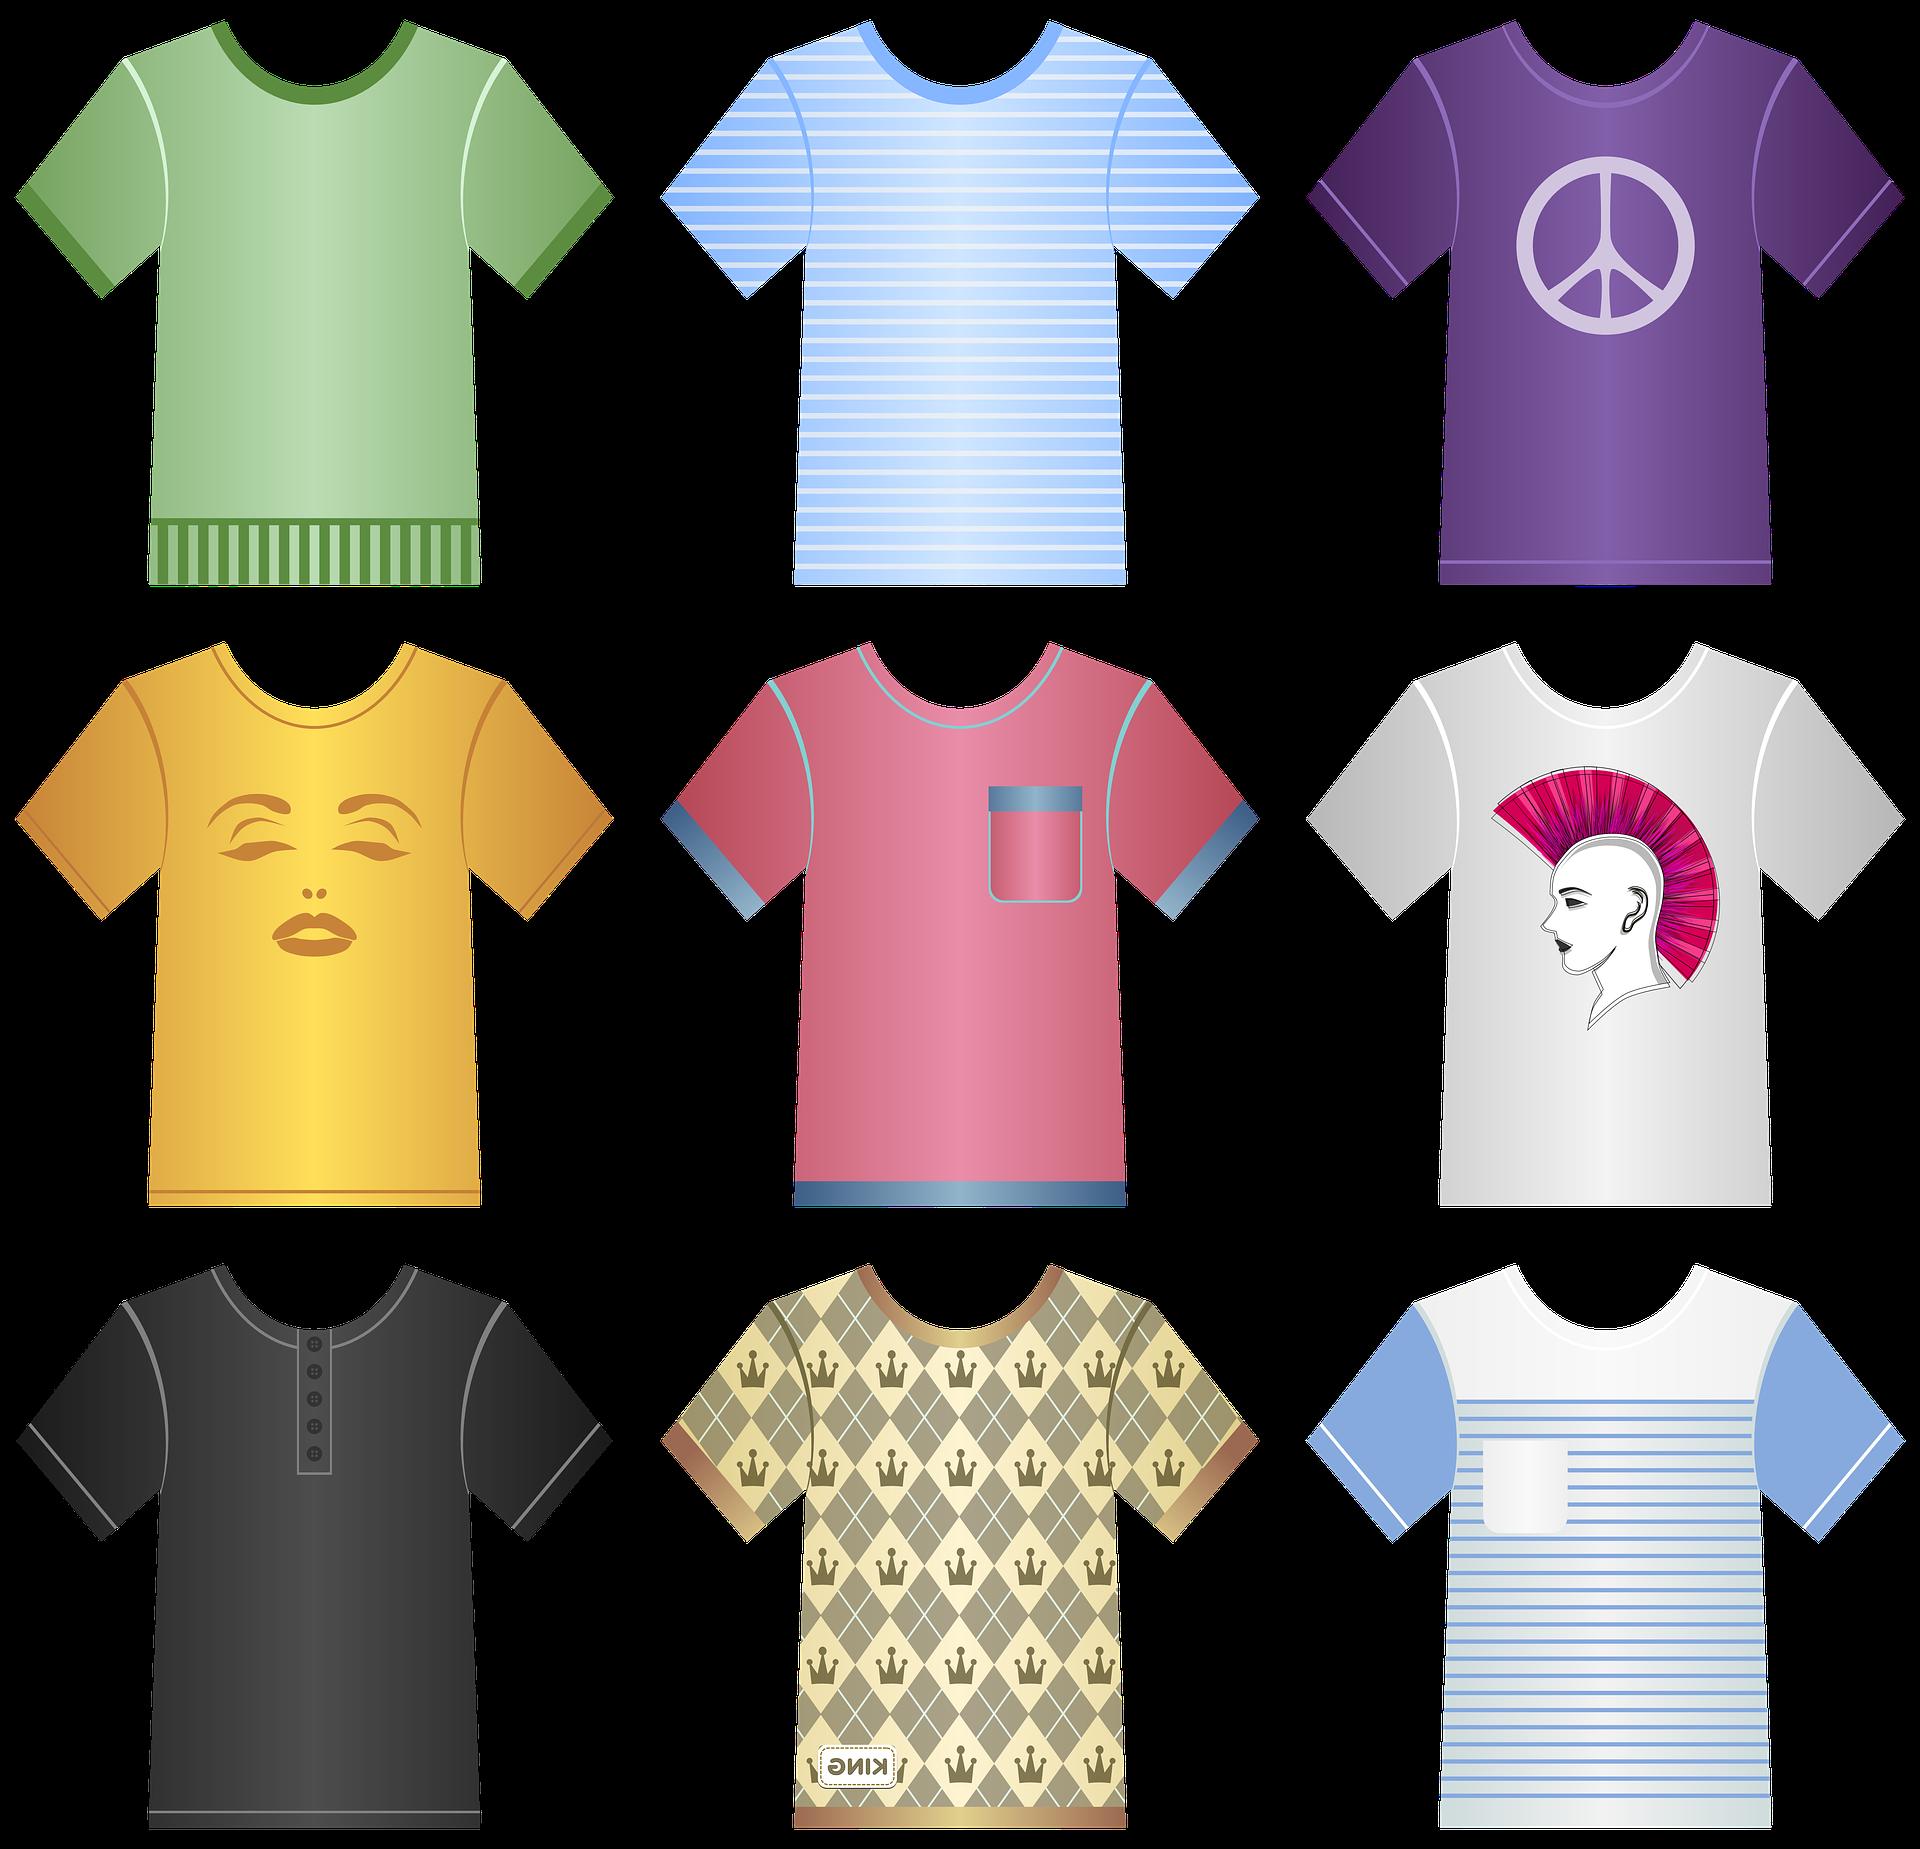 t-shirts-1144189_1920